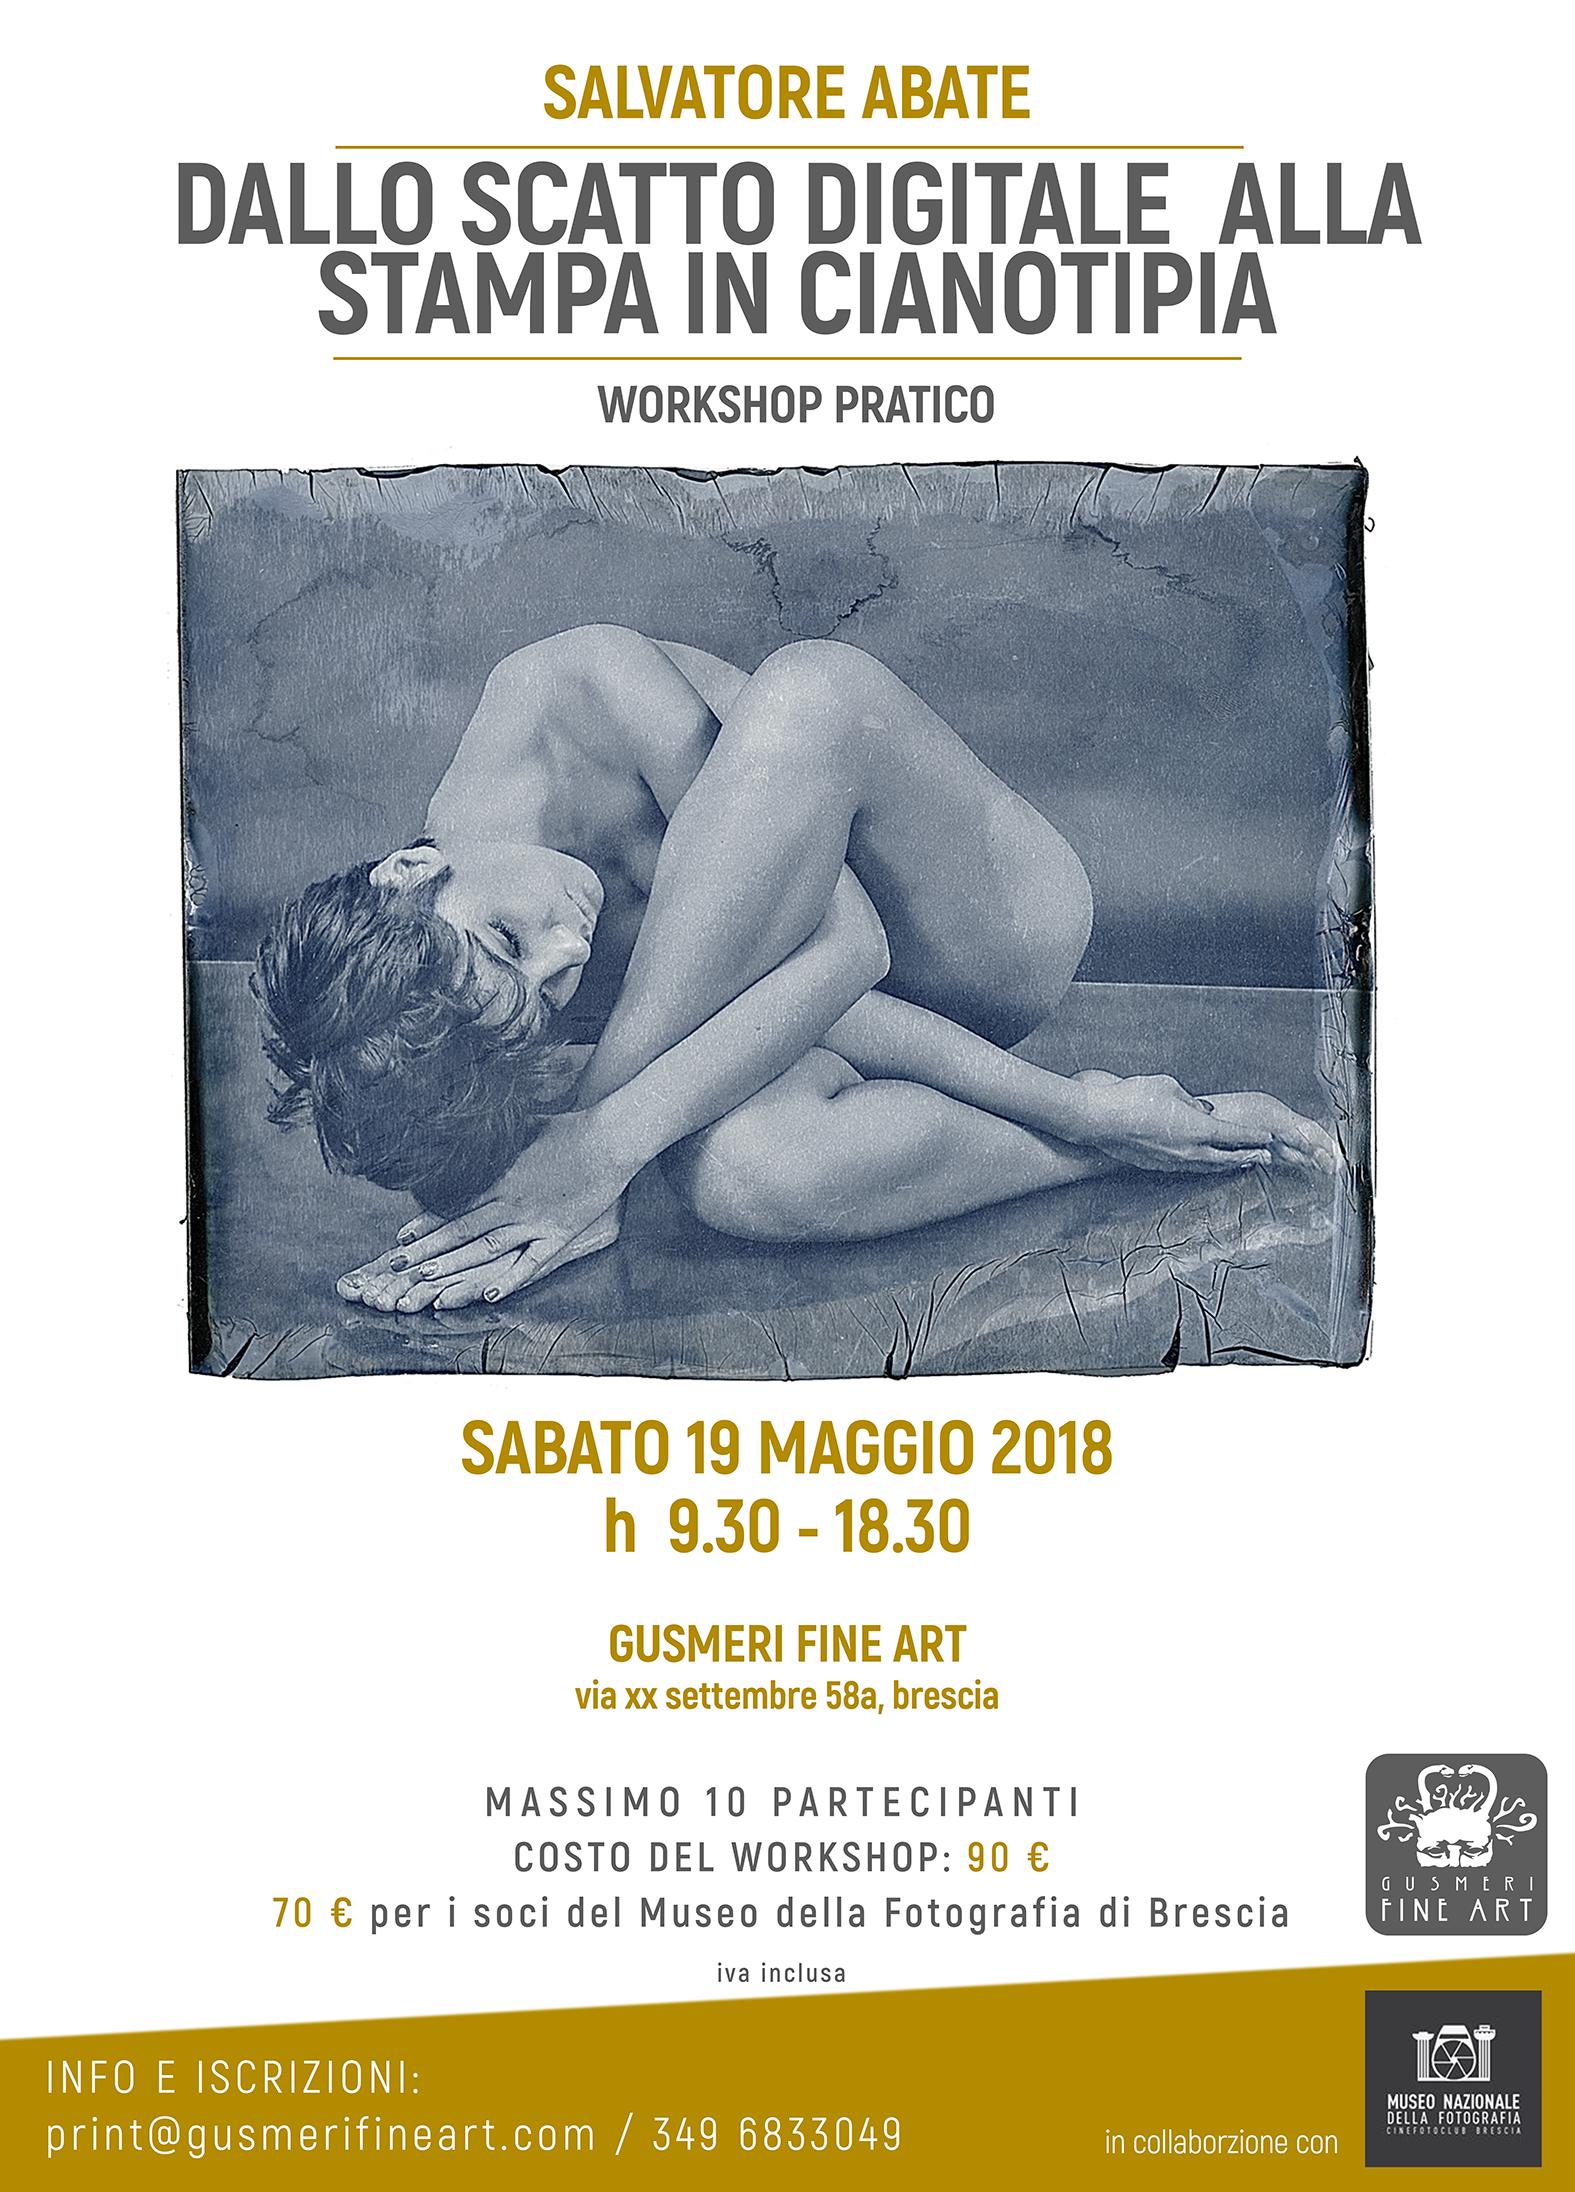 locandina_salvatore abate 19maggio2018